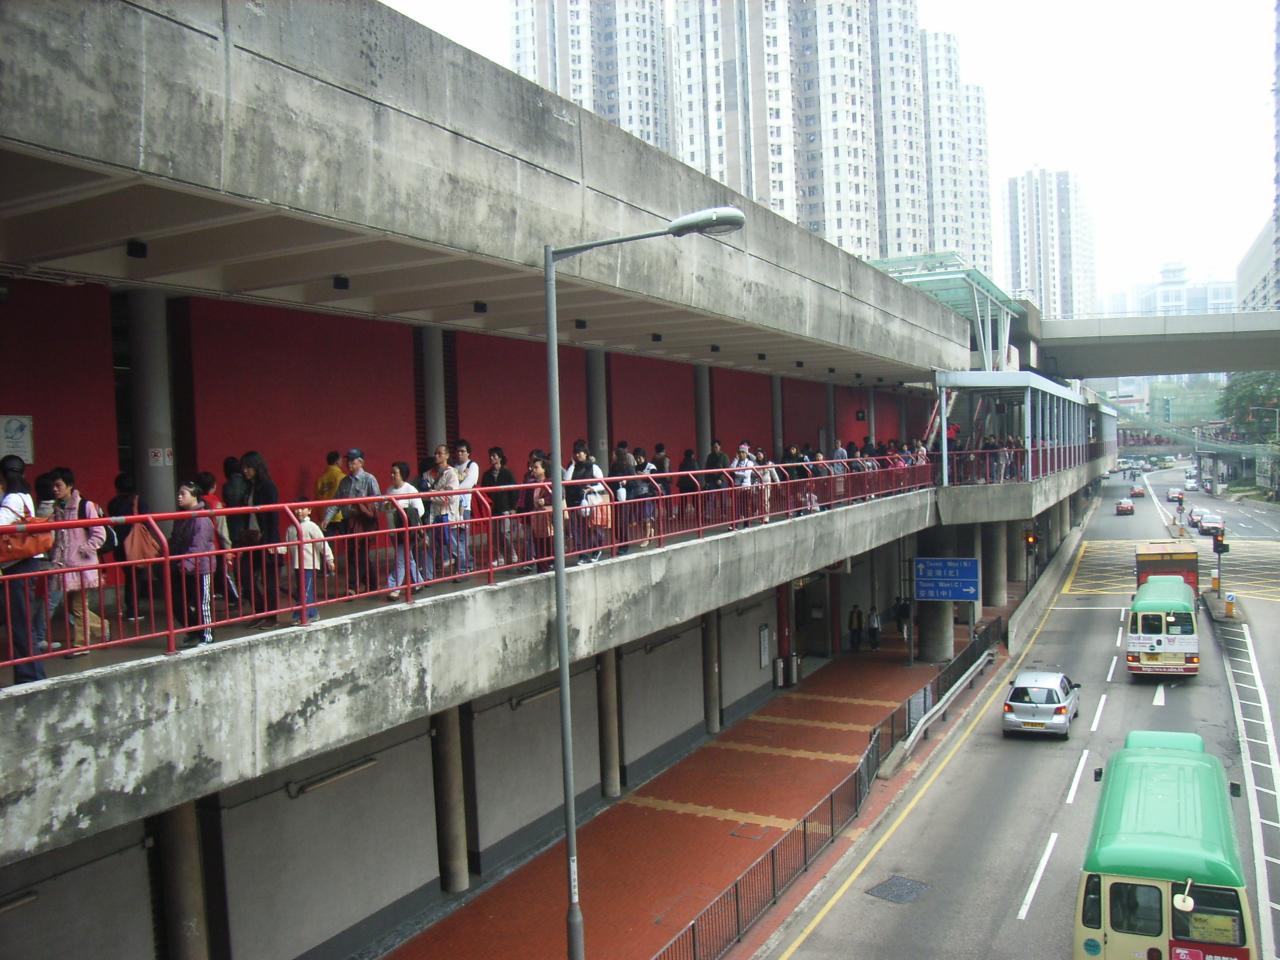 HK_MTR_Tsuen_Wan_Station_A_Sai_Lau_Kok_Road.JPG